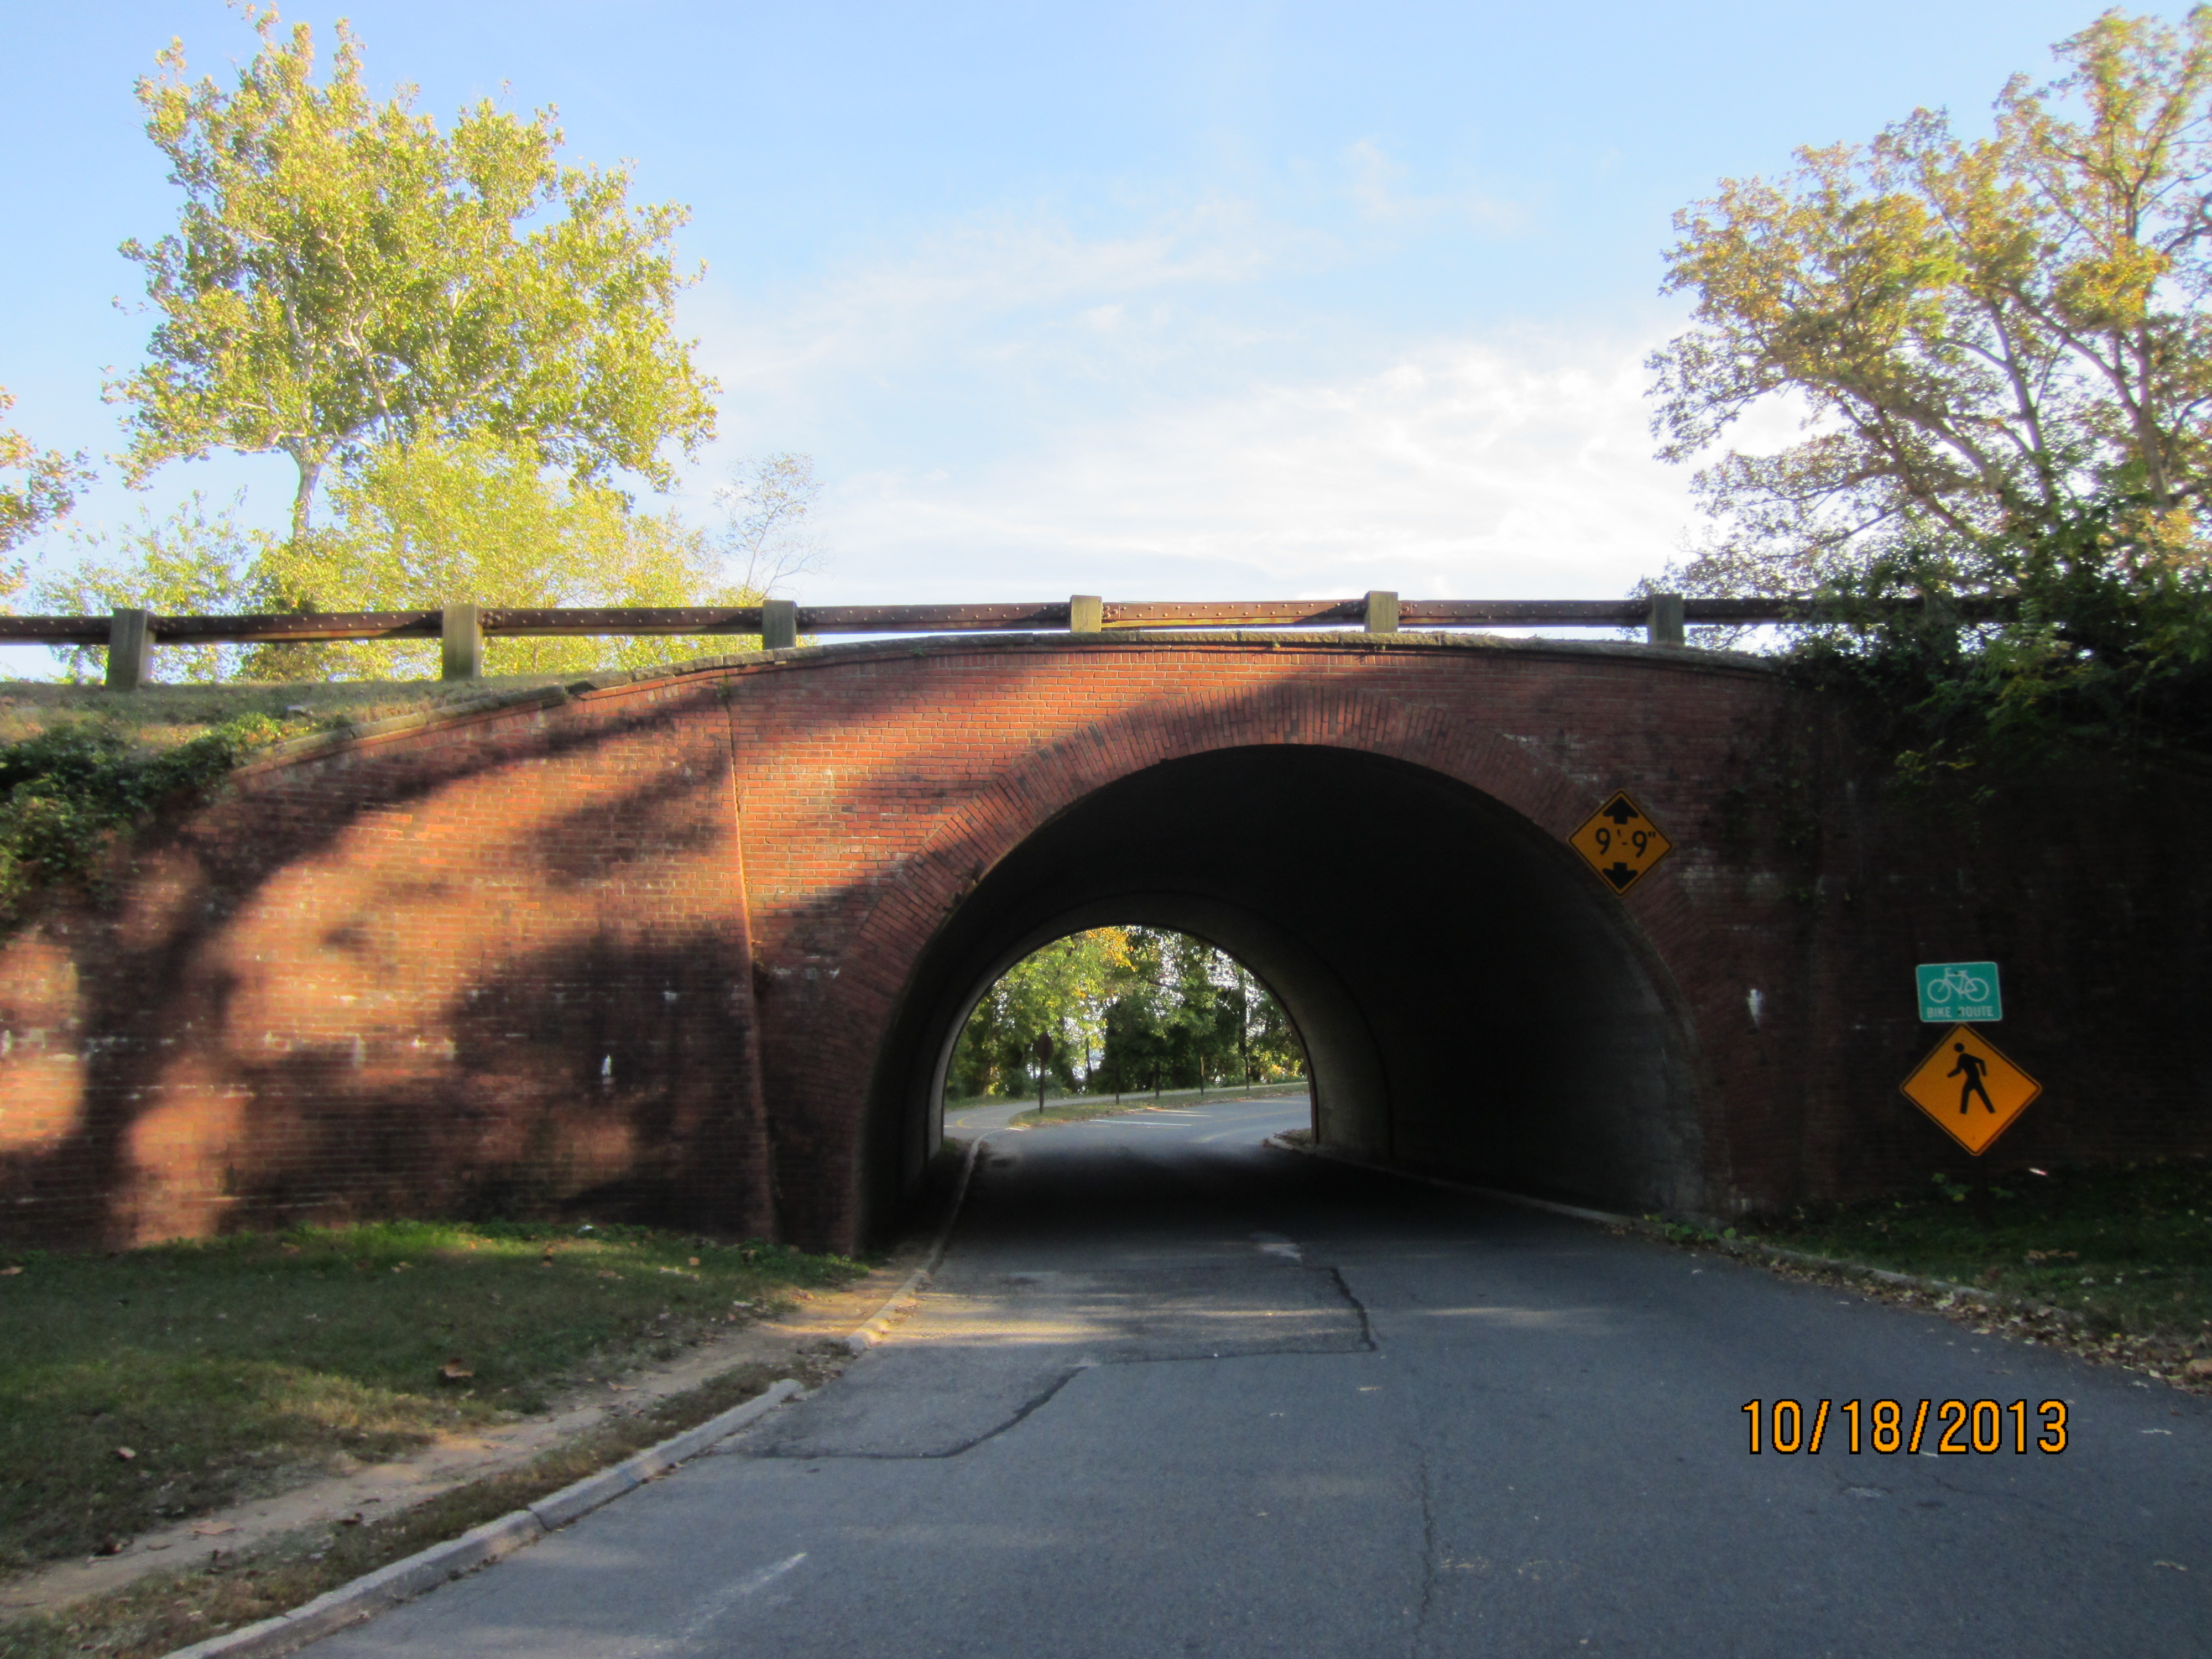 George Washington Memorial Parkway Trestle Bridge, Fort Hunt Park